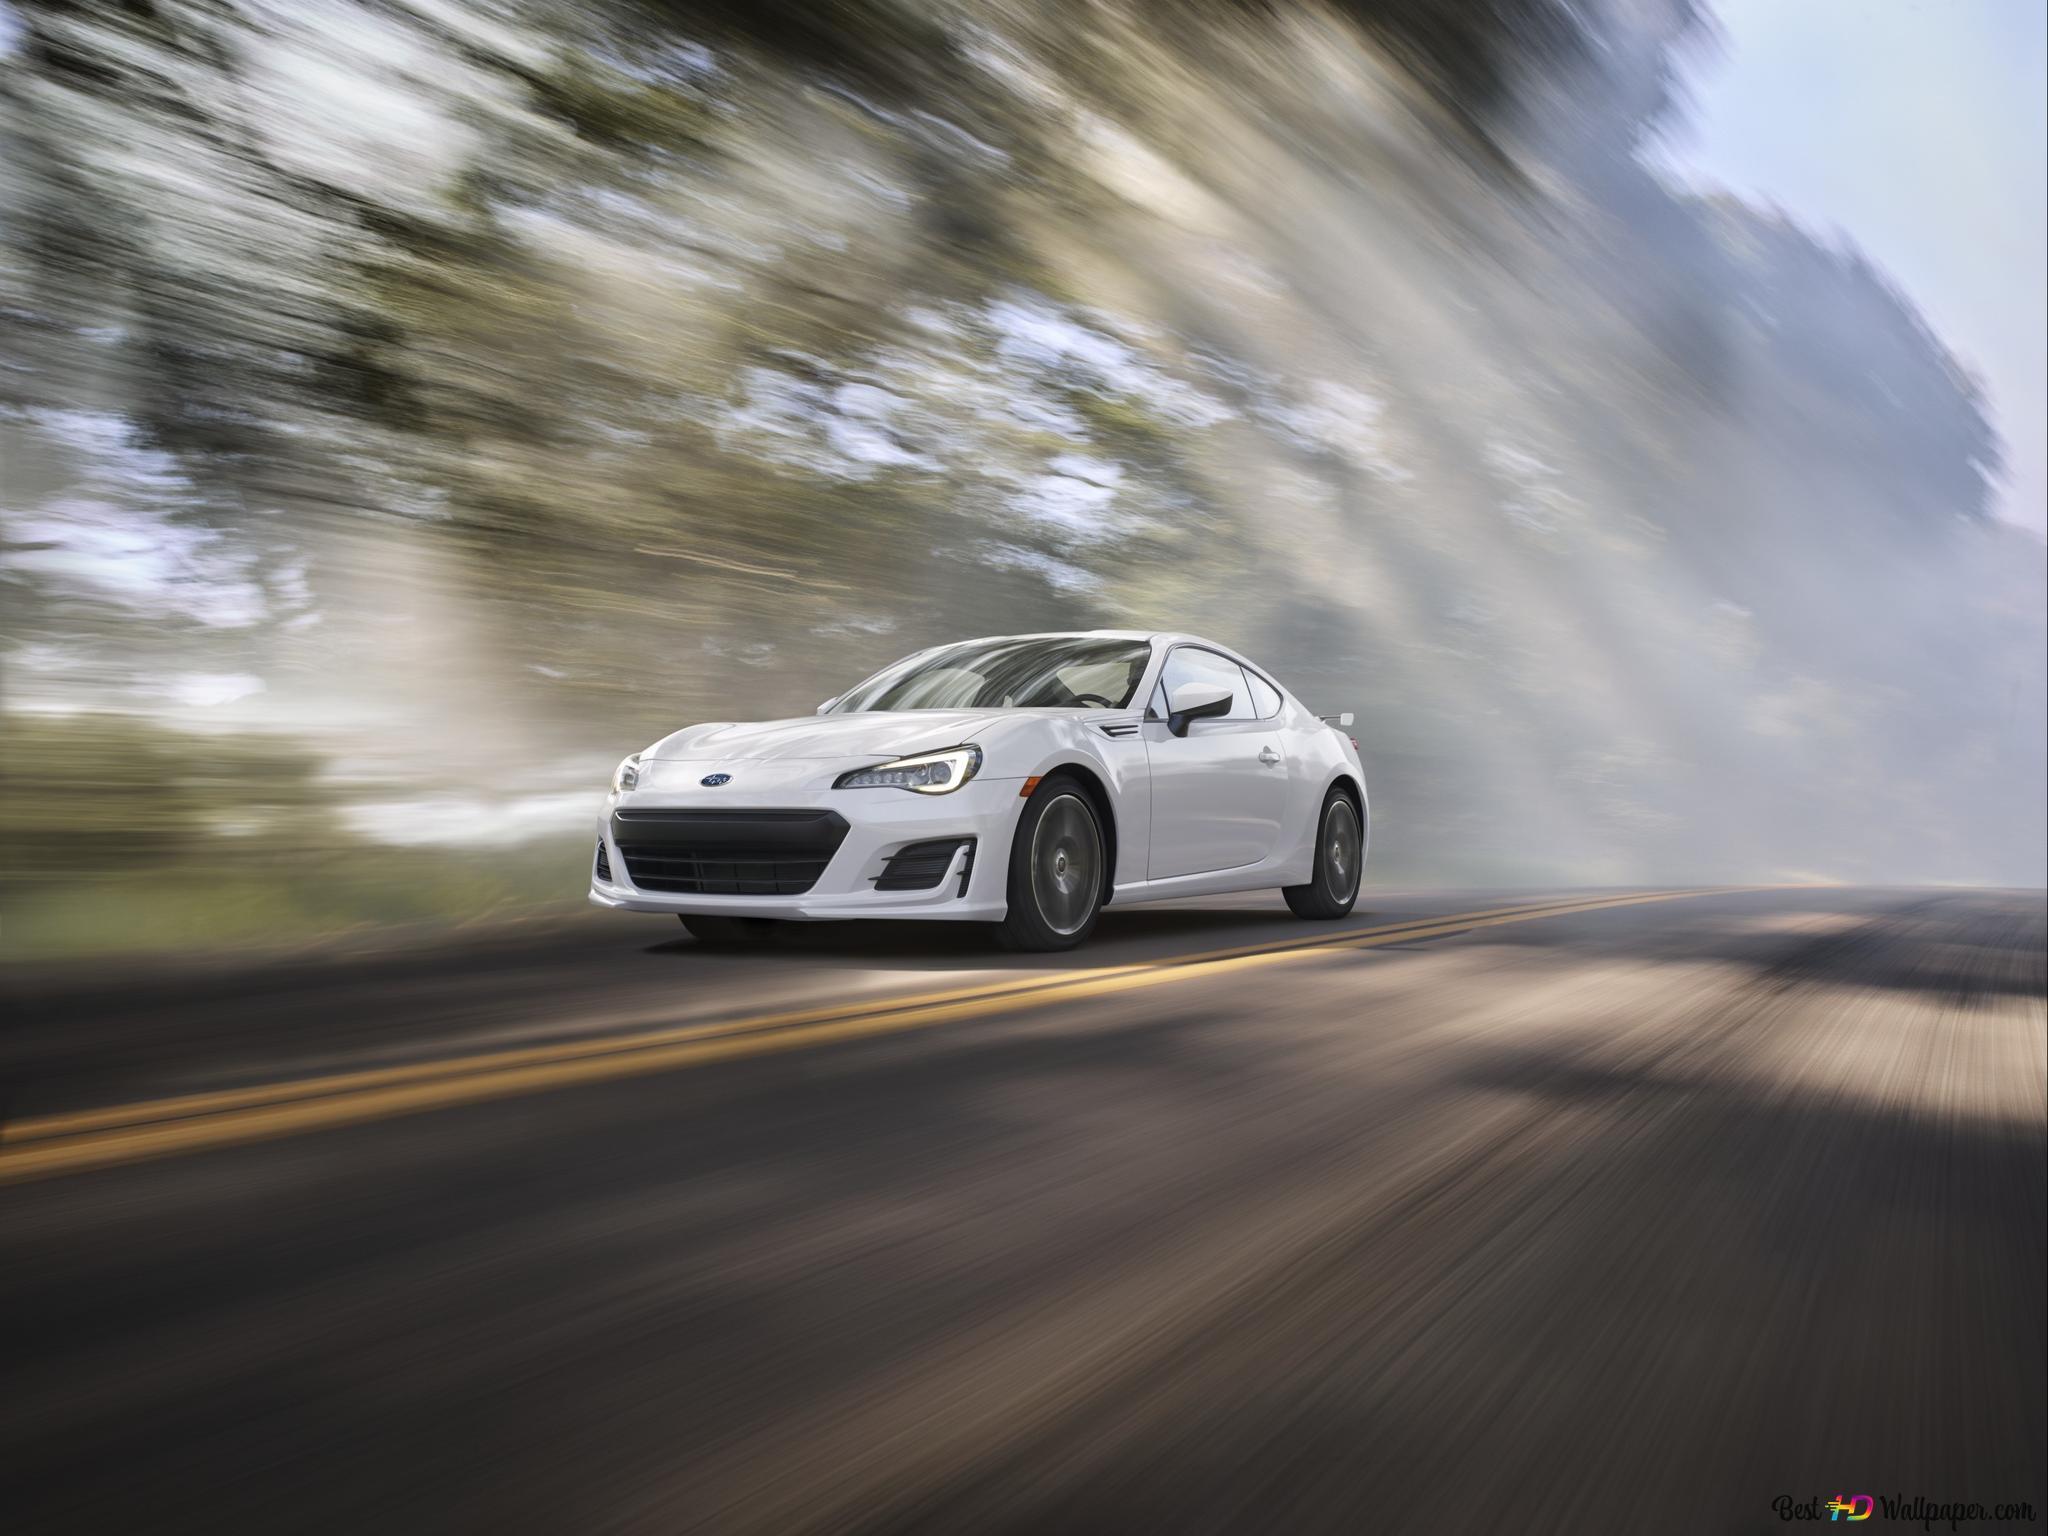 White Subaru Brz Sport Car Going Son Fast Hd Wallpaper Download